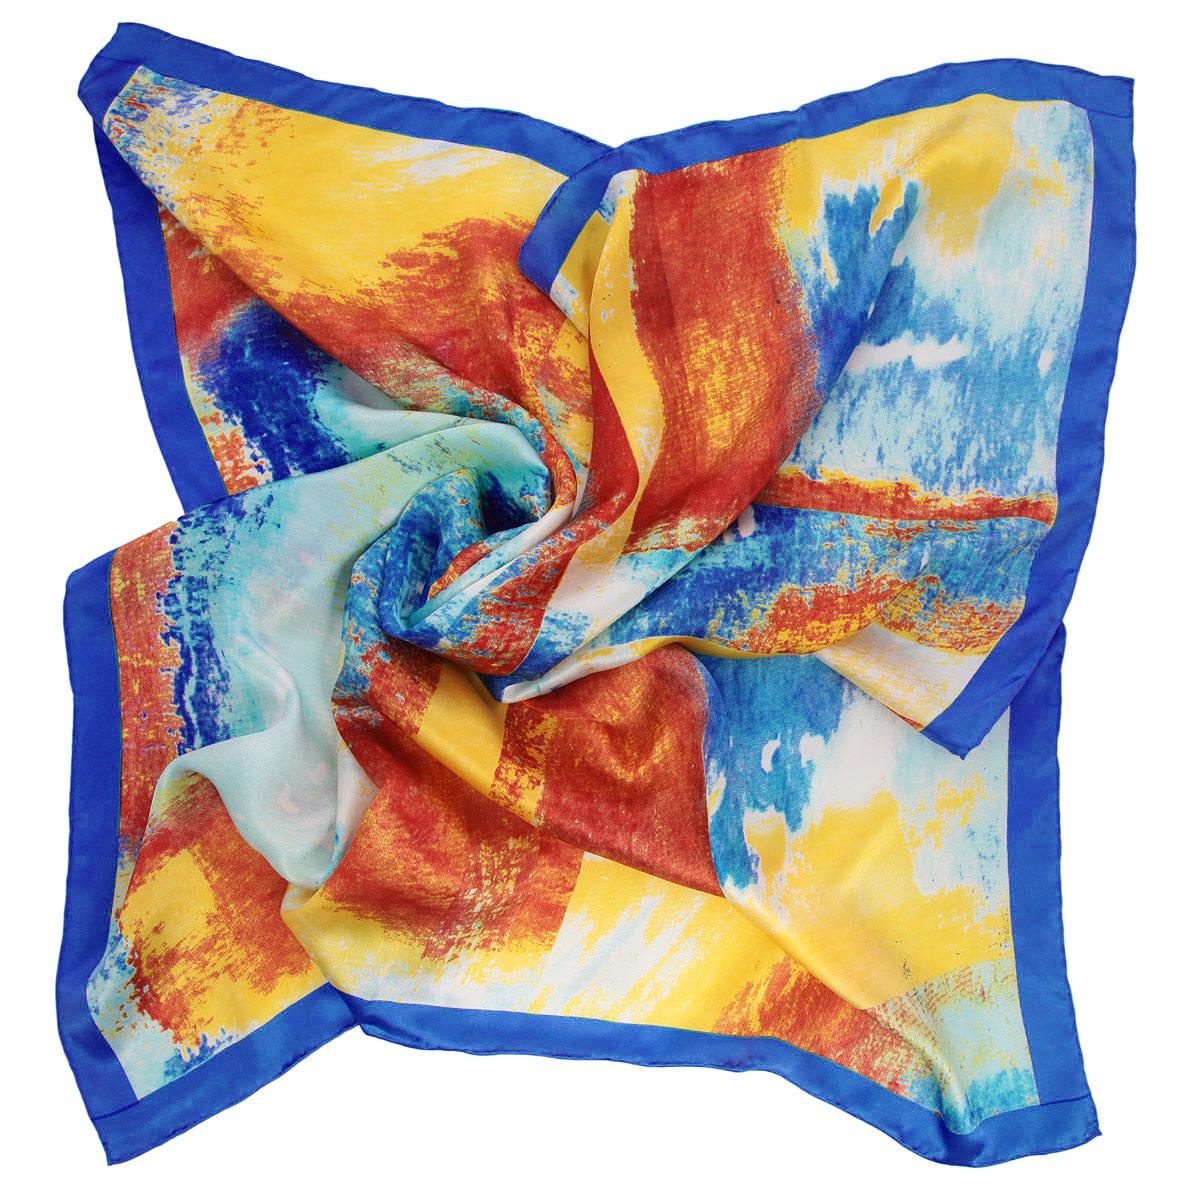 Платок женский Venera, цвет: синий, оранжевый, желтый. 1801829-5. Размер 90 см х 90 см stylish jewel neck plaid faux twinset design long sleeve sweater for women